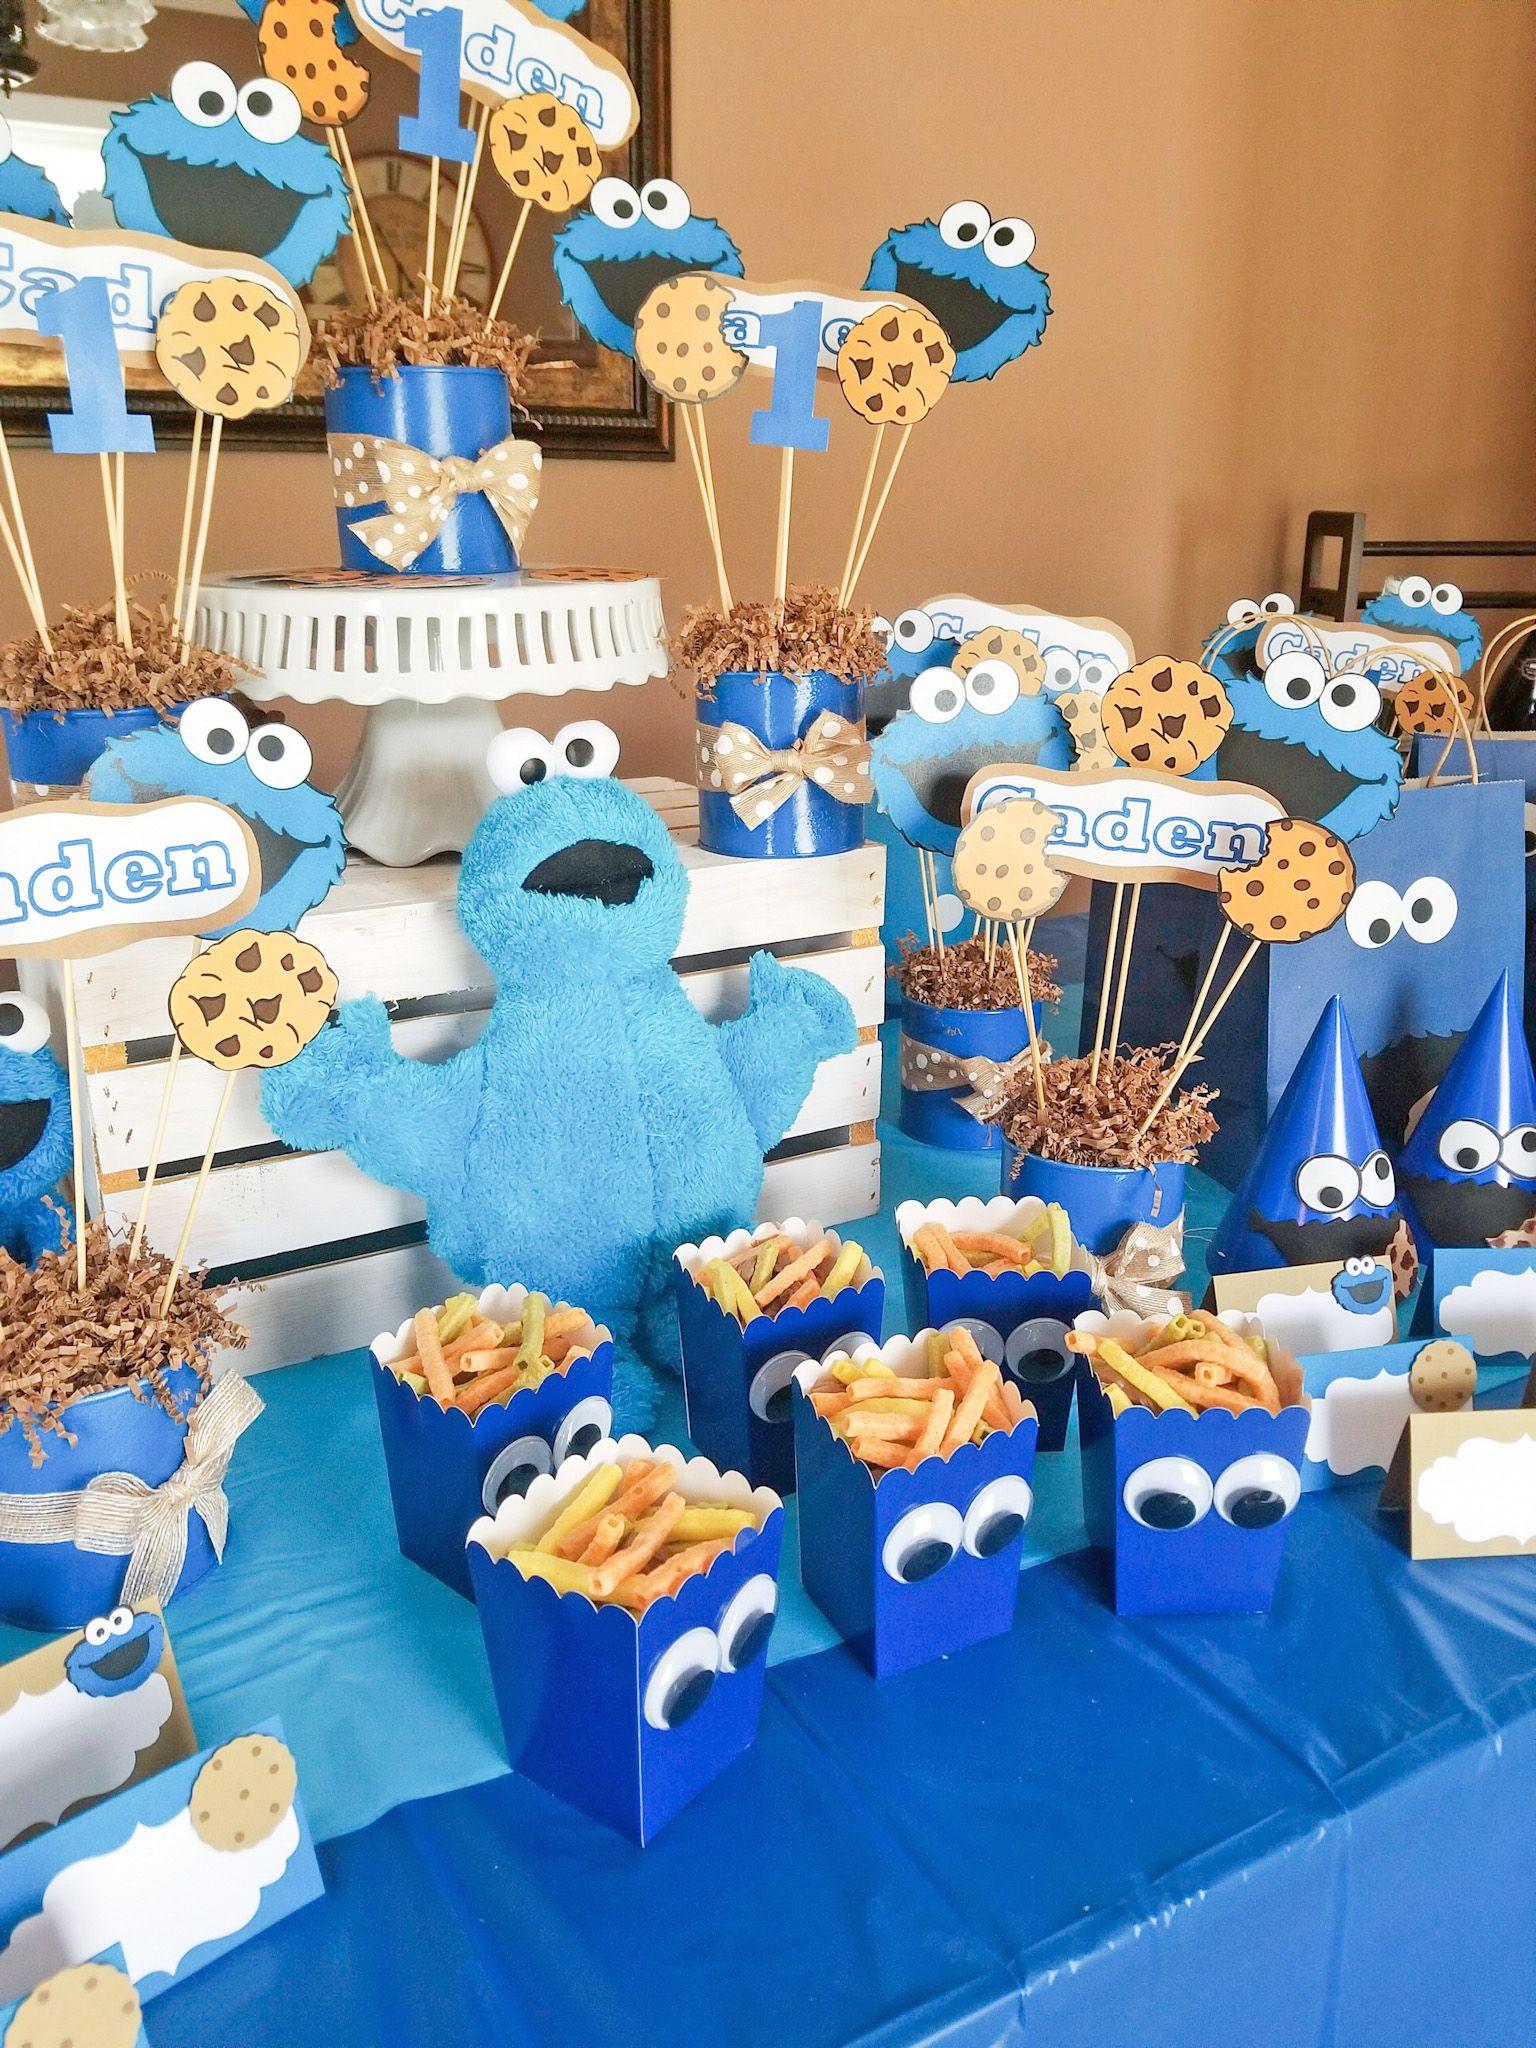 DIY Cookie Monster Party | Cookie monster party, Birthday ...